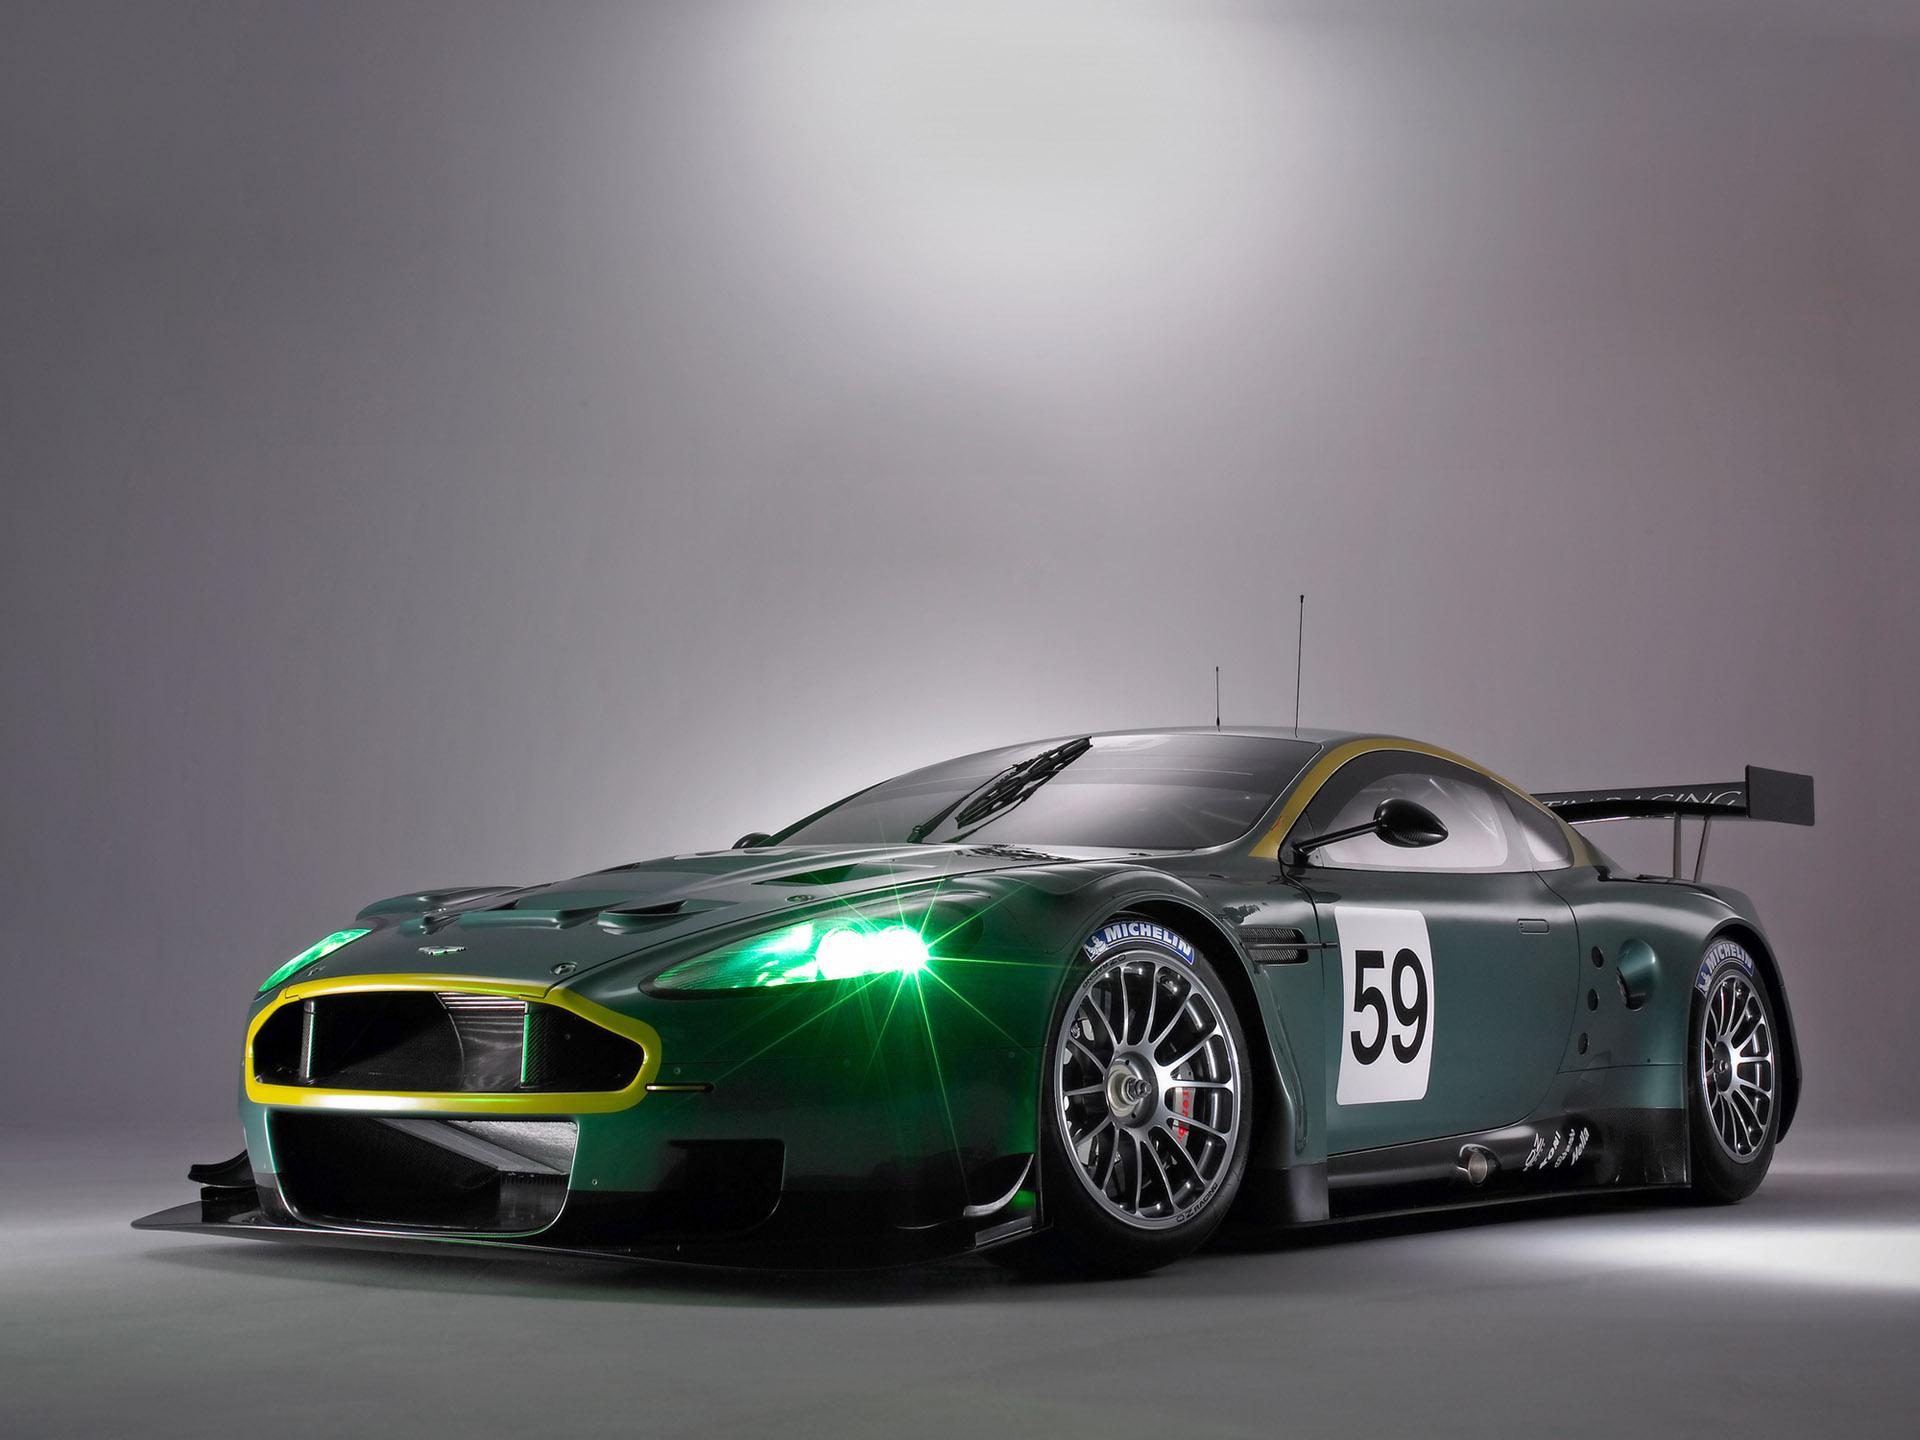 Wallpaper Mobil Sport Aston Martin: Aston Martin DB Full HD Wallpaper And Hintergrund